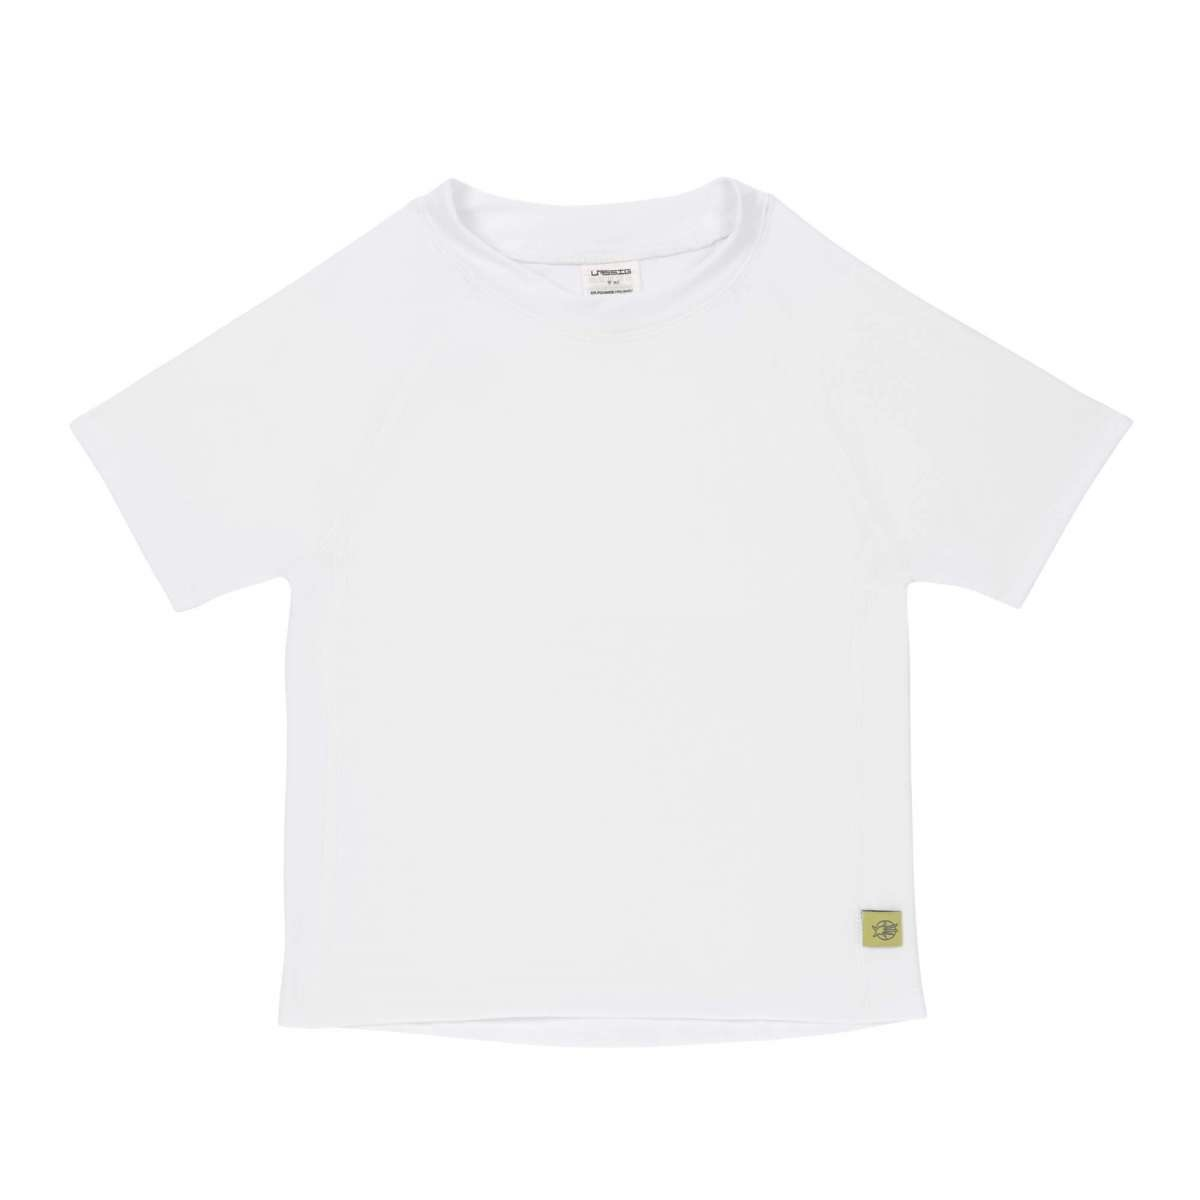 LASSIG Short Sleeve UPF Shirt - White